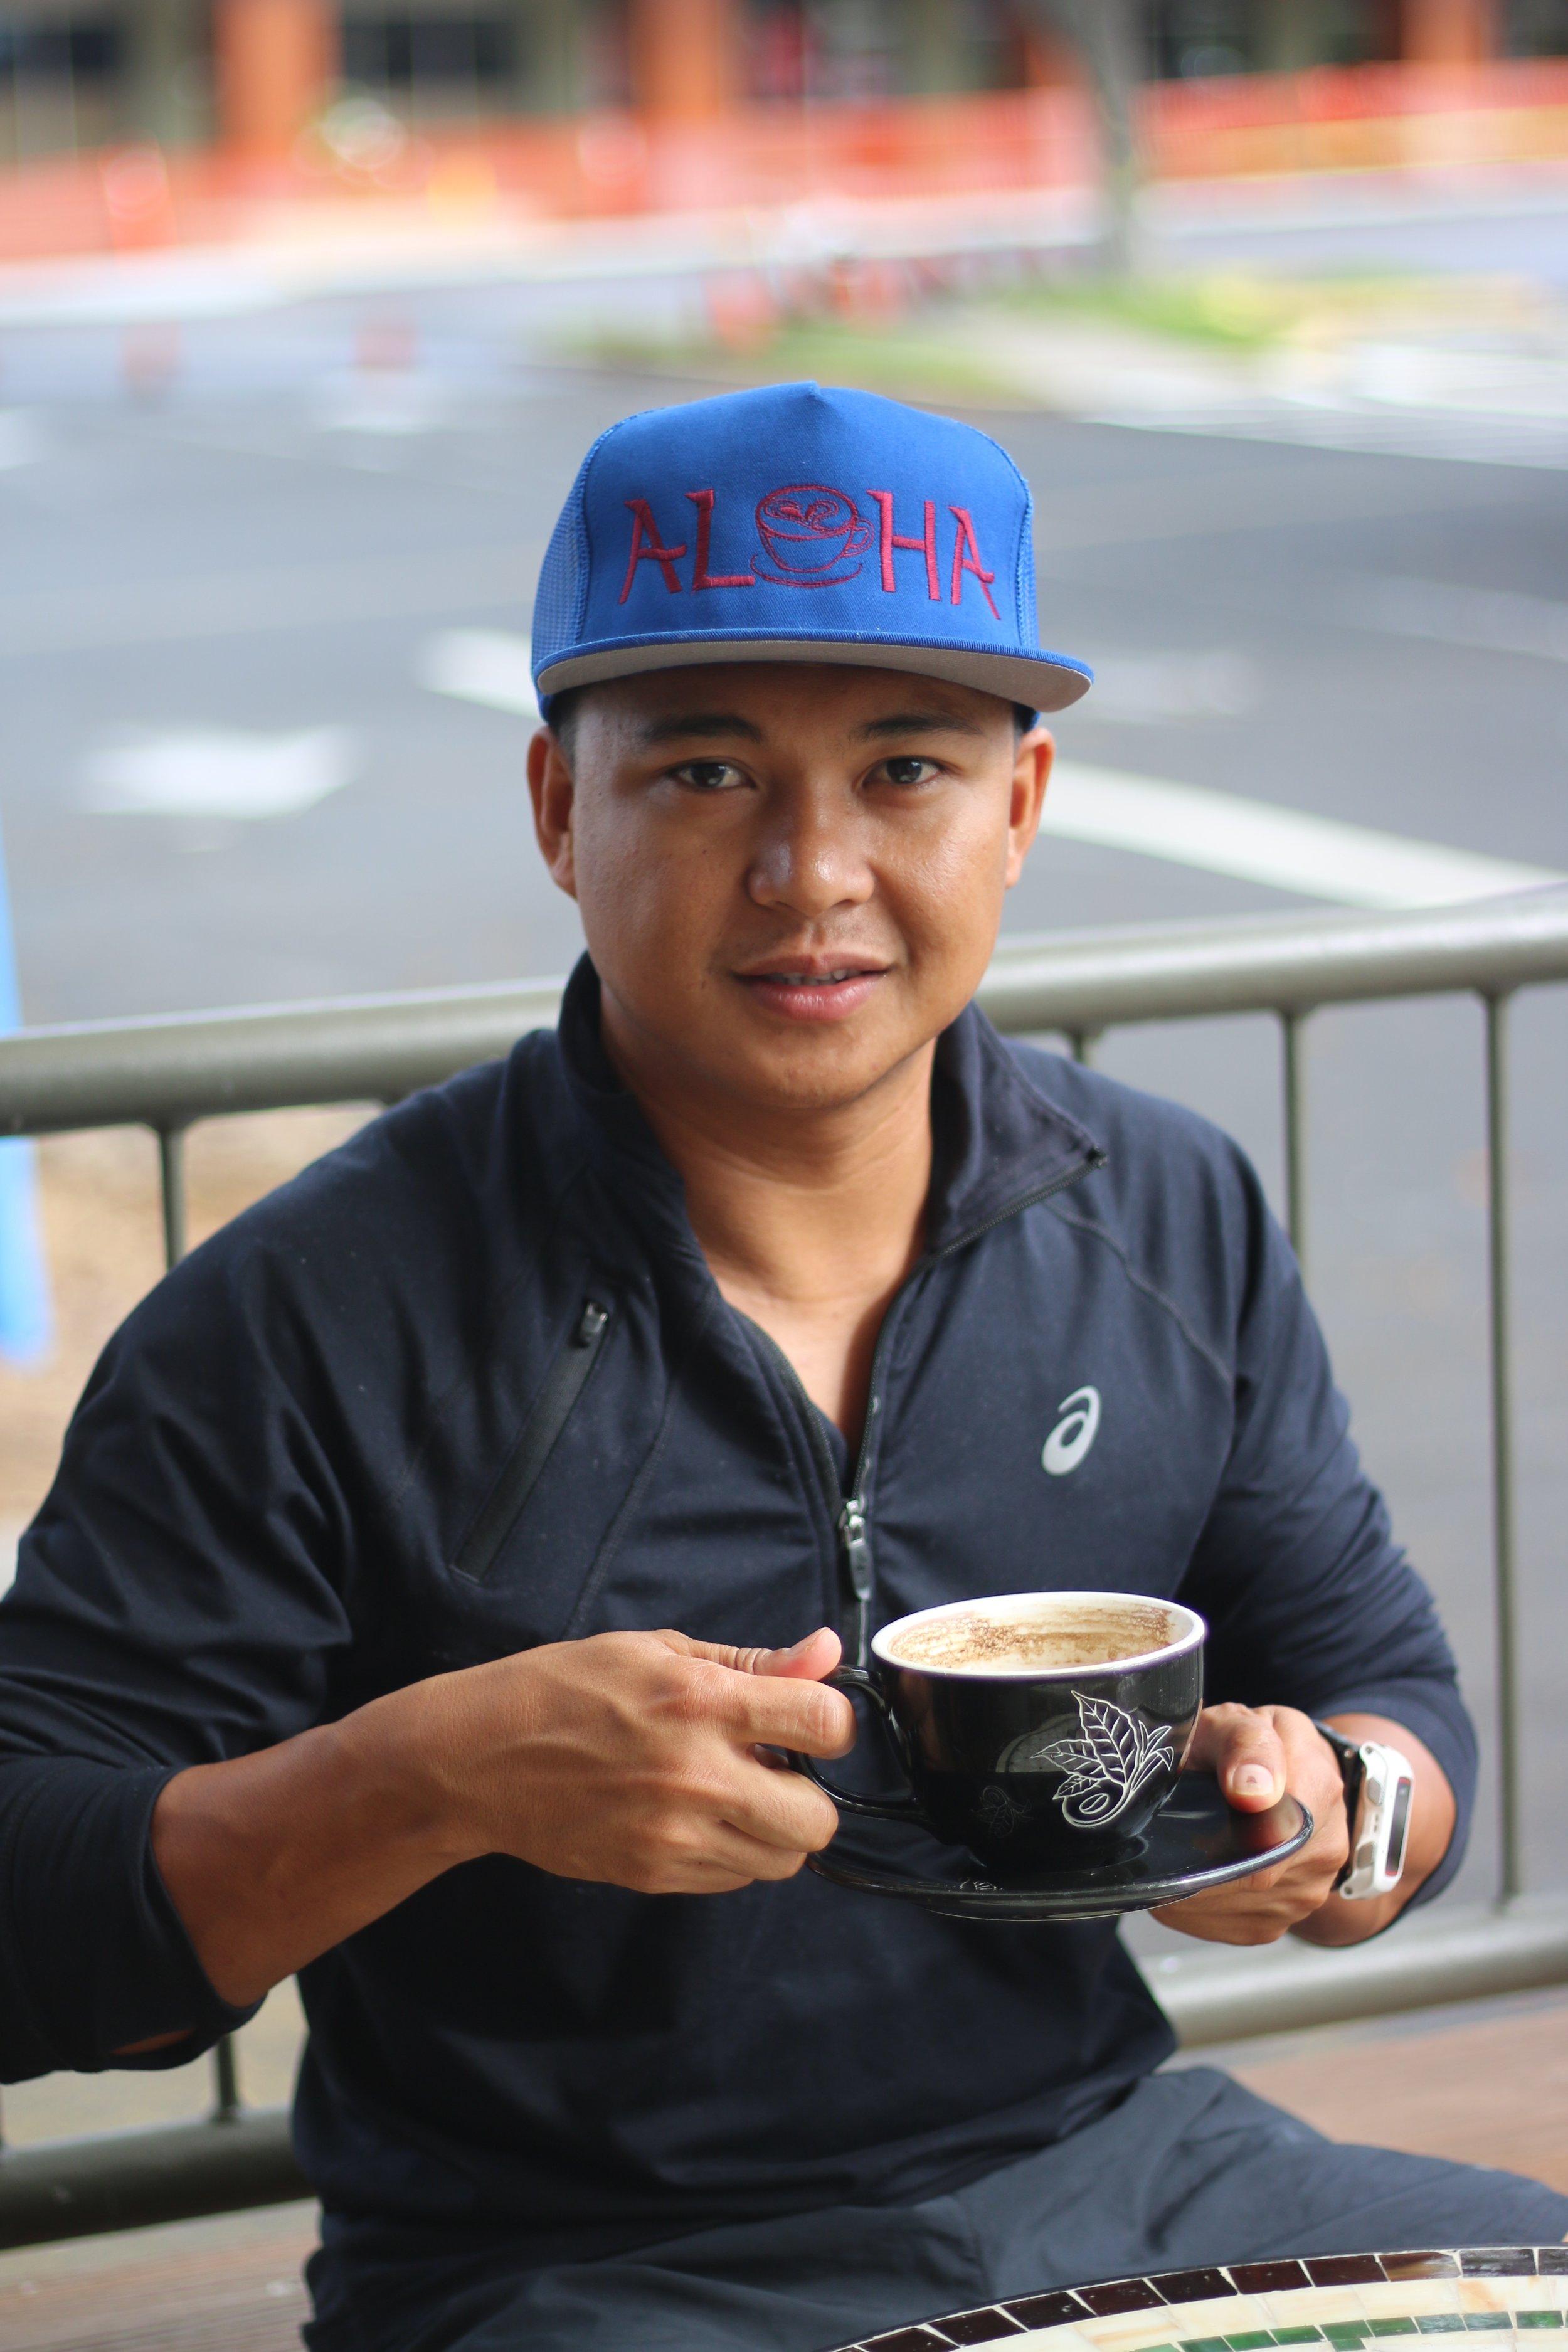 Cisco enjoying his 100% Kona cofee after training. PHOTO: Chance Ortiz